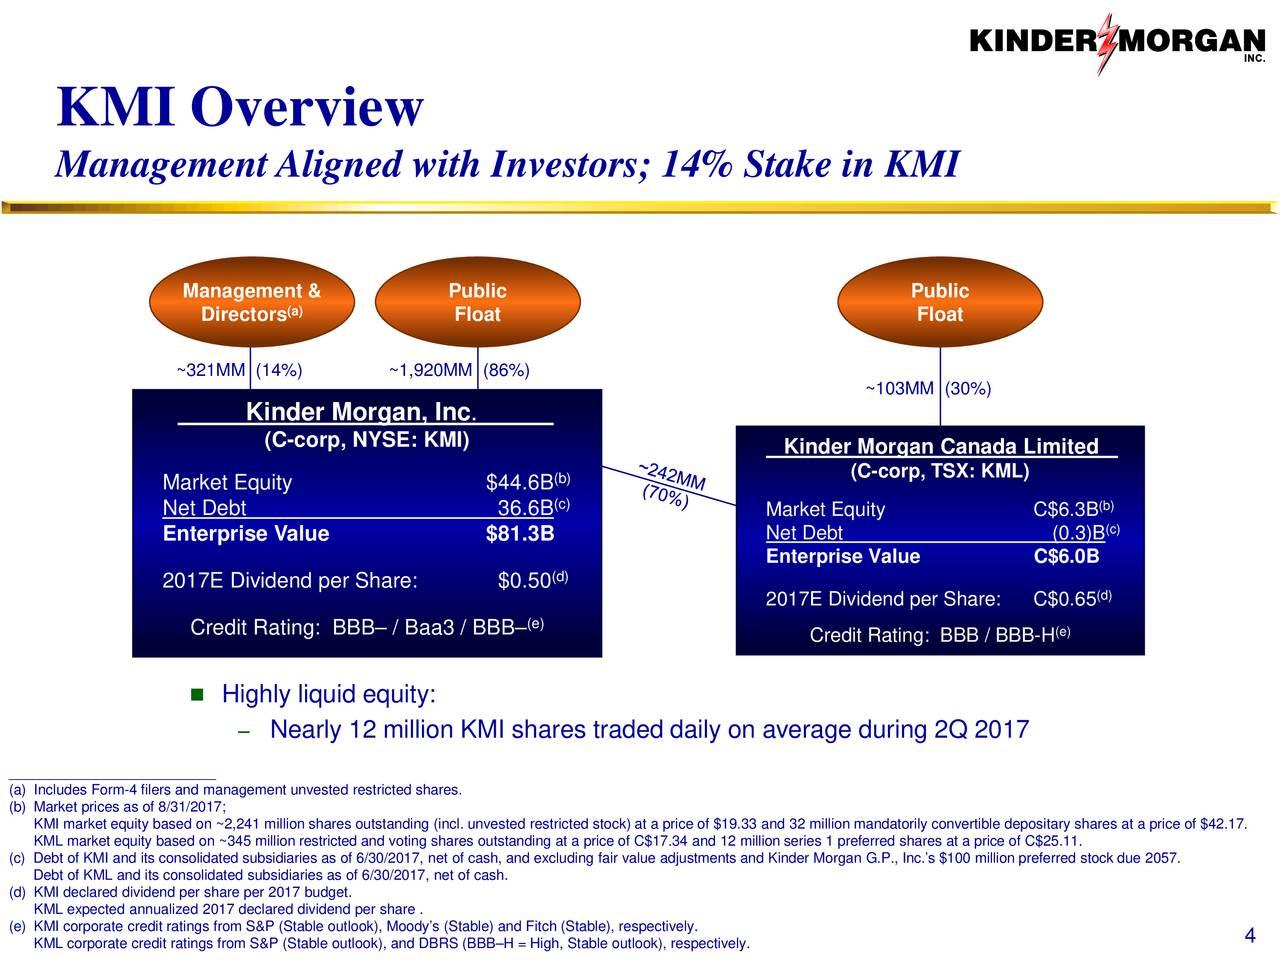 Kinder Morgan Stock Quote Marathon Petroleum Presents At Barclays Ceo Energy.100 Securities